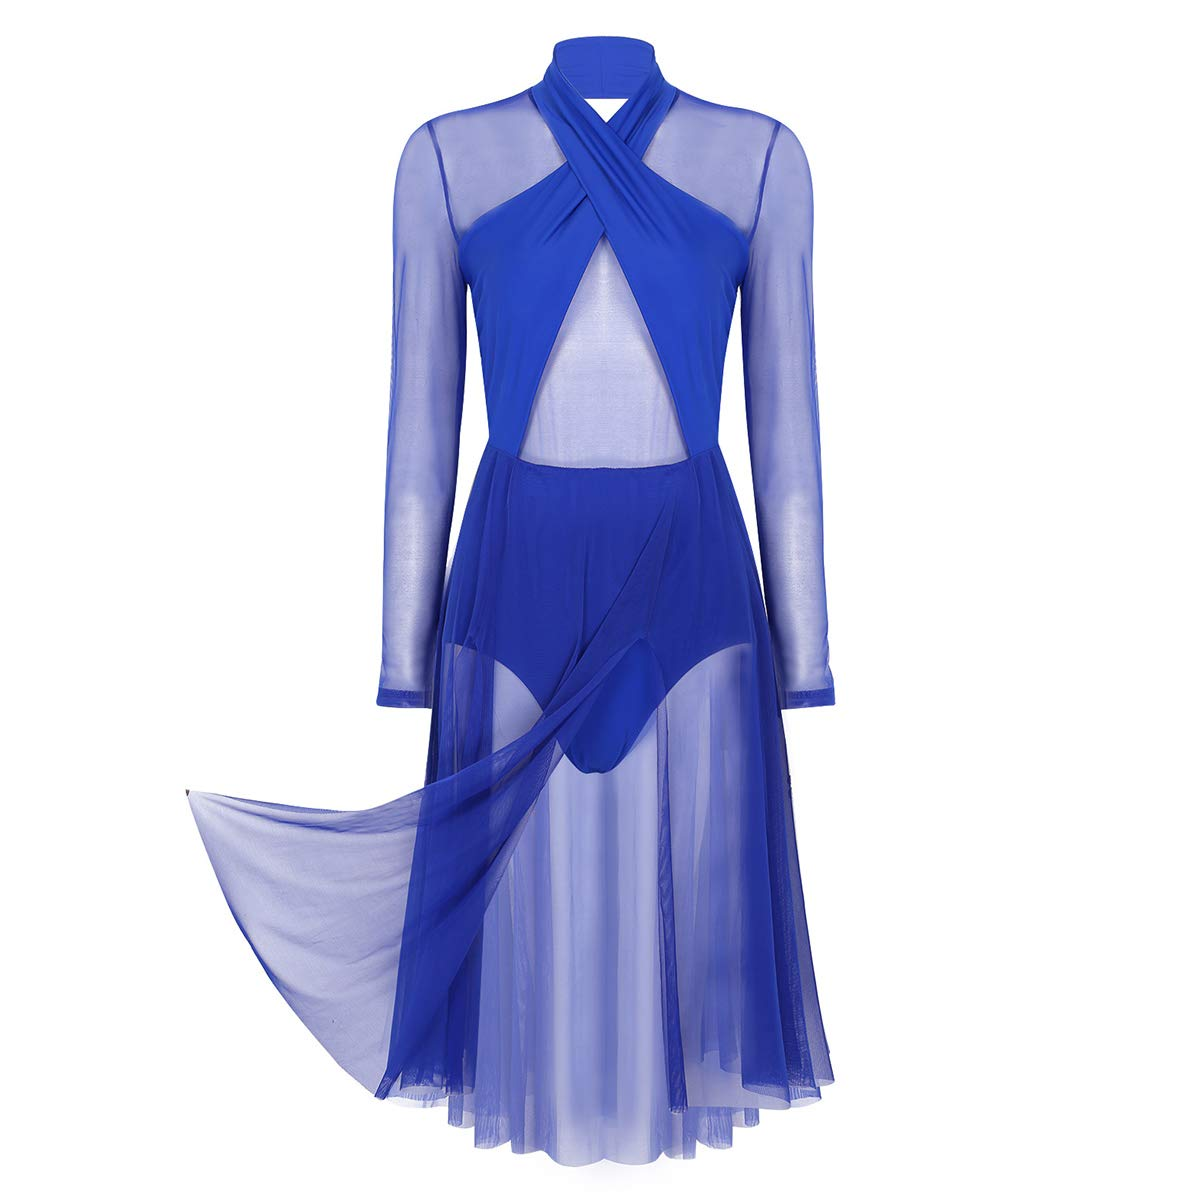 inhzoy Womens Sheer Mesh See Through Lyrical Dance Costume Halter Neck Long Sleeves Leotard Dress